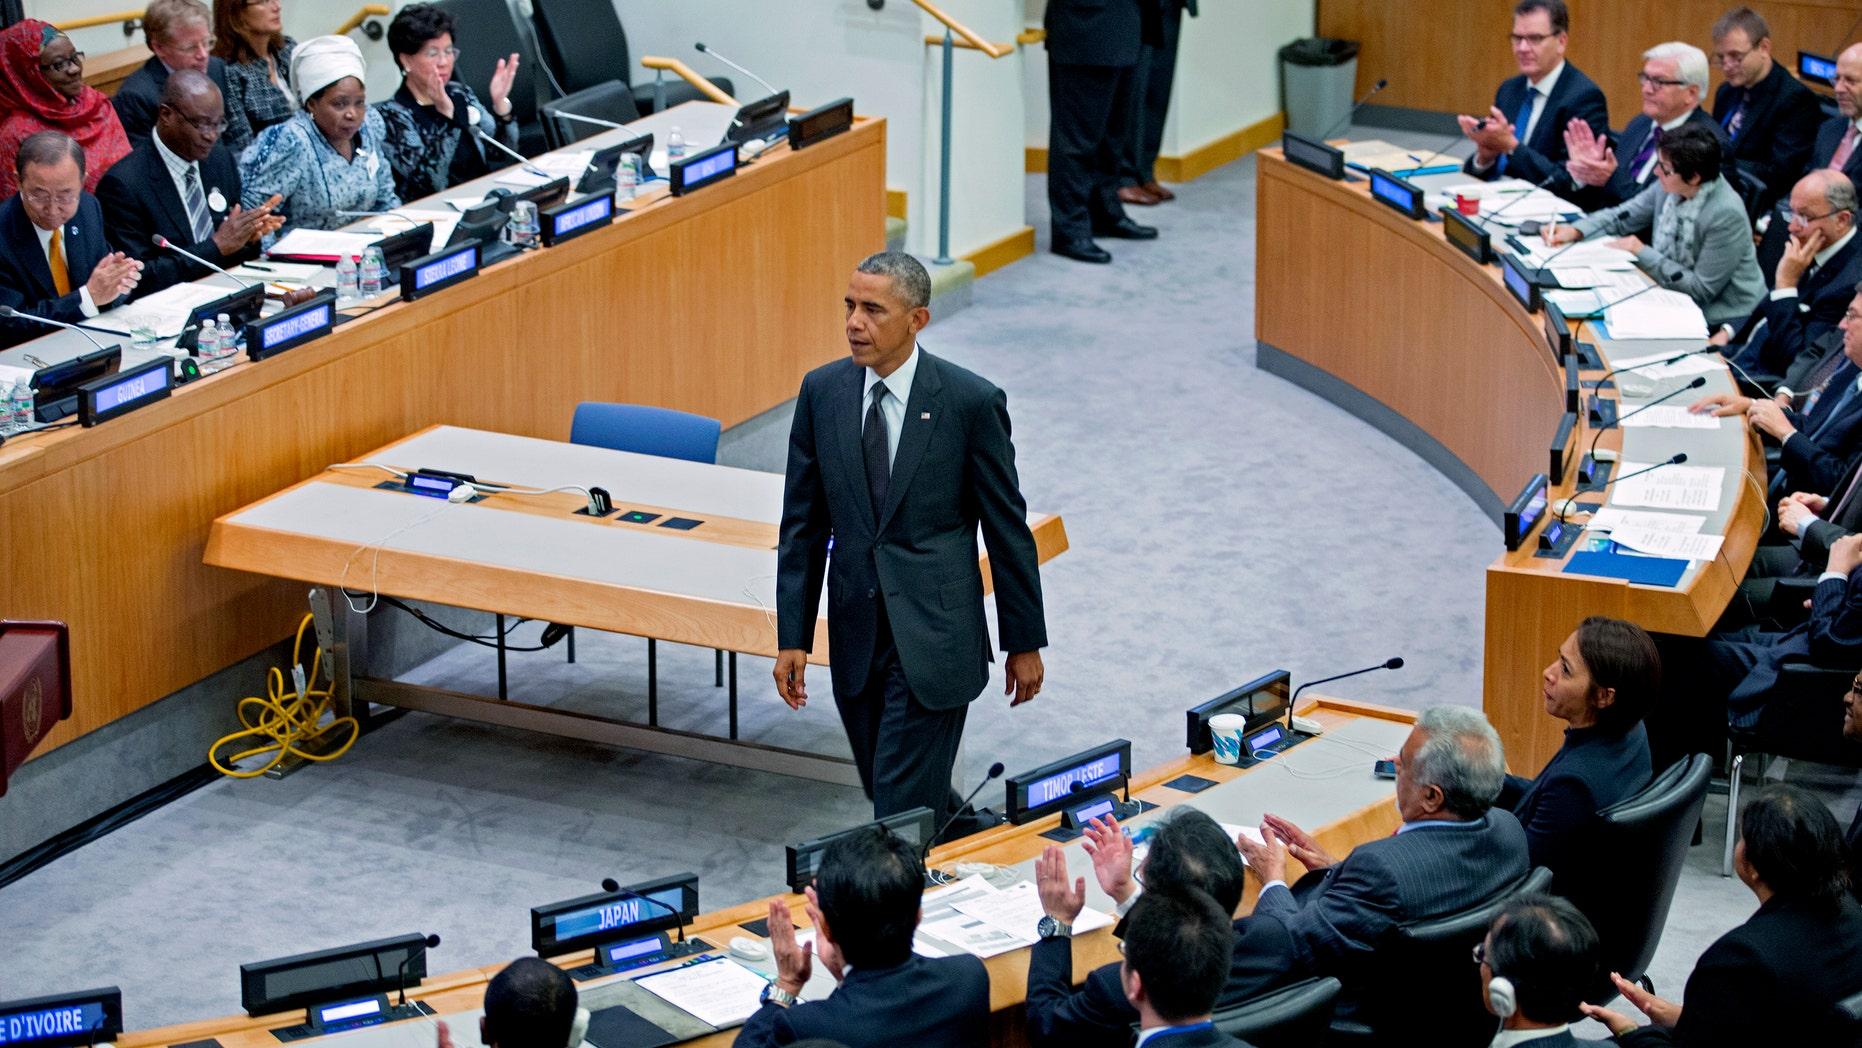 President Barack Obama at U.N. headquarters, Thursday, Sept. 25, 2014.